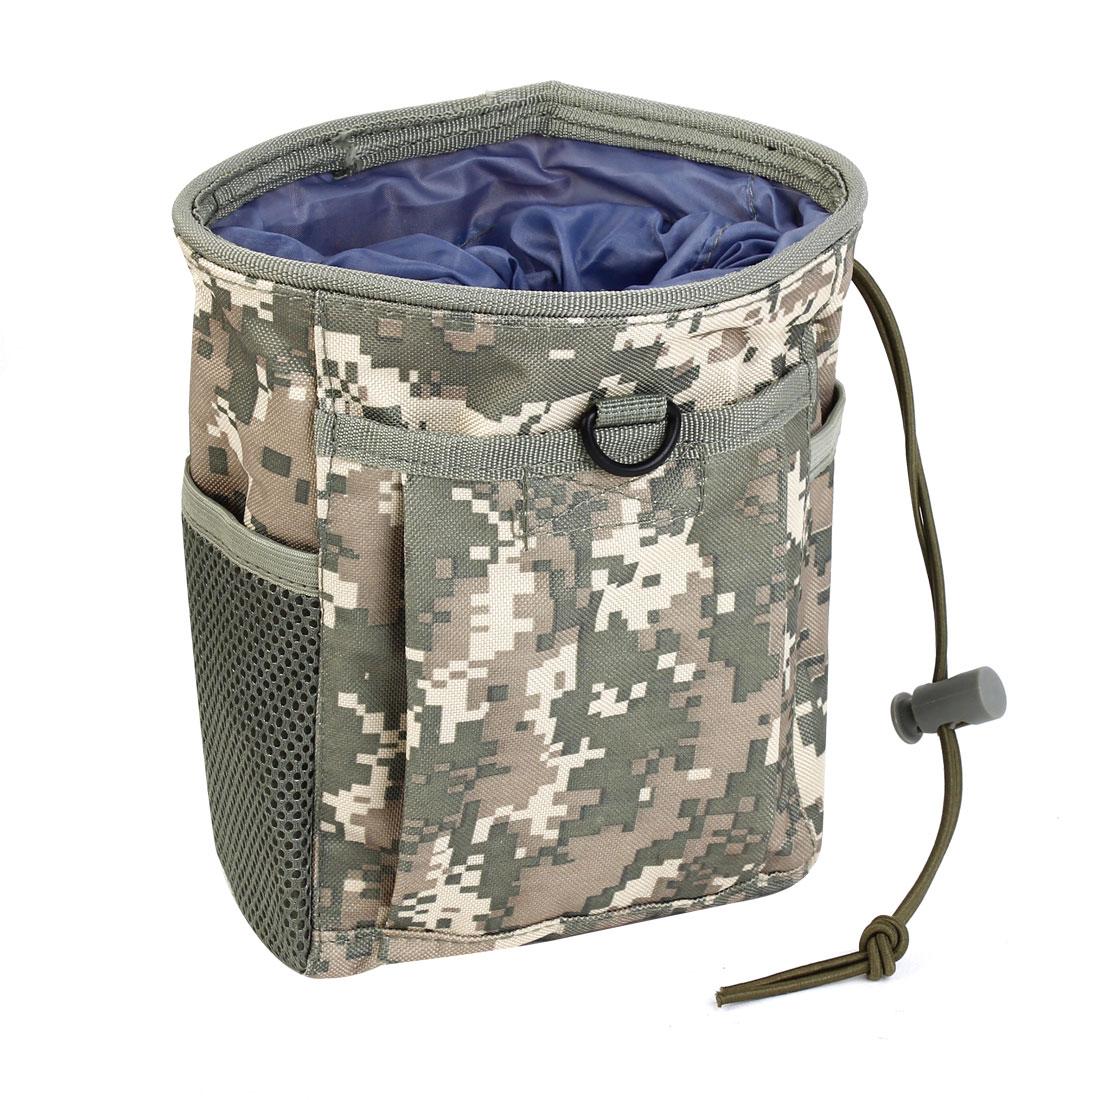 Army Camping Travel Supply Drawstring Closure Camouflage Recycling Bag Green Gray